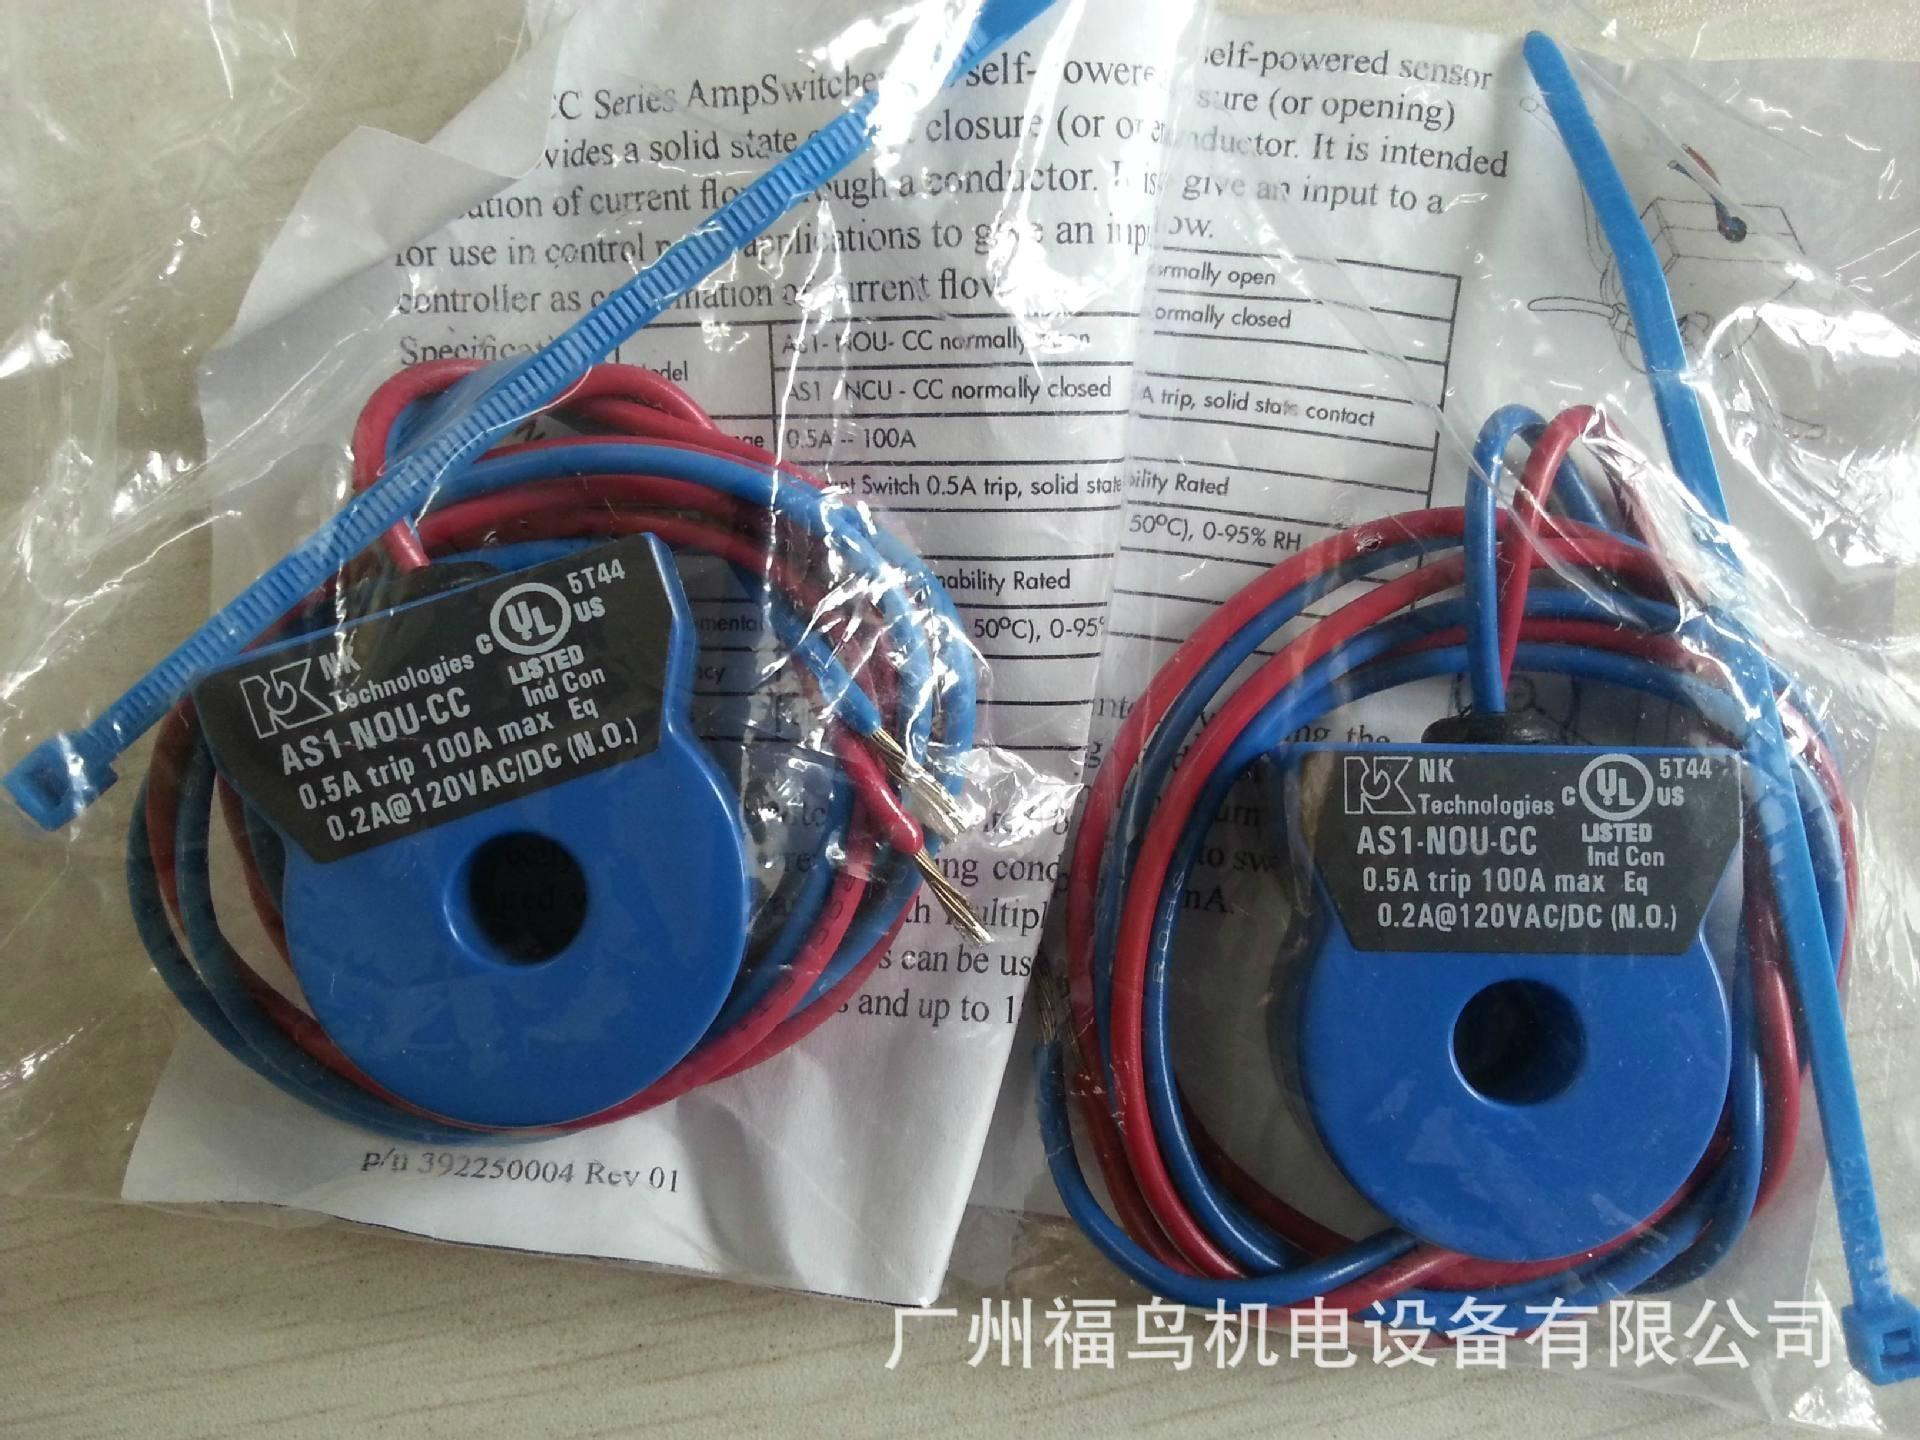 NK TECHNOLOGIES電流互感器, 型號: AS1-NOU-CC